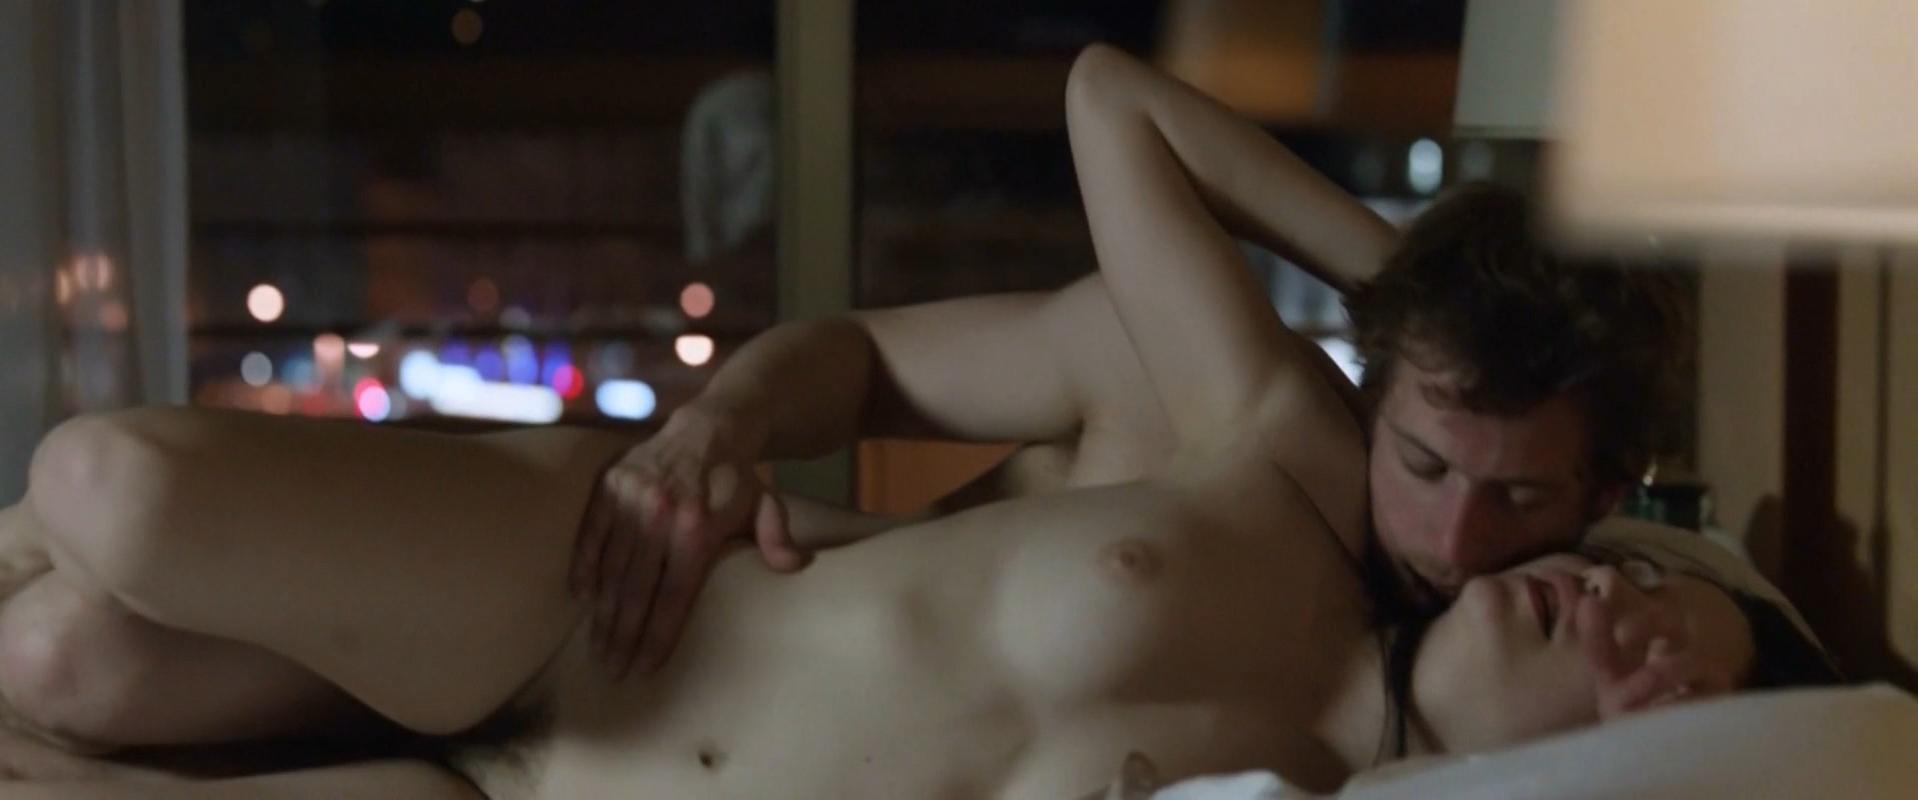 Audrey Bastien nude, Solene Rigot nude - Puppylove (2013)